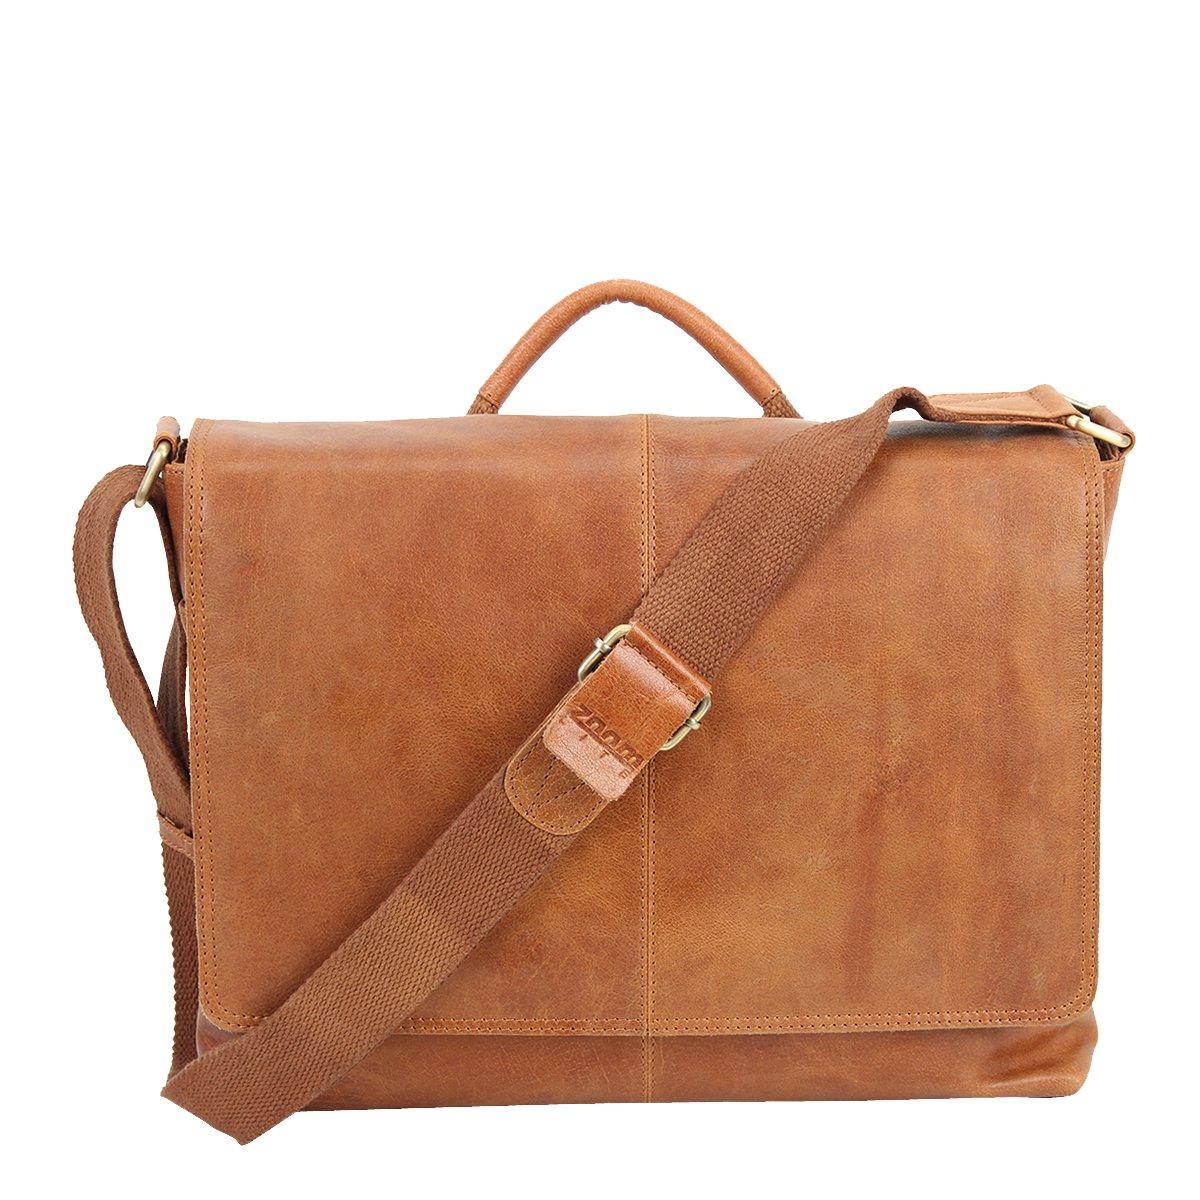 Parker Vintage Leather iLaptop Bag, by Zoomlite (Tan)